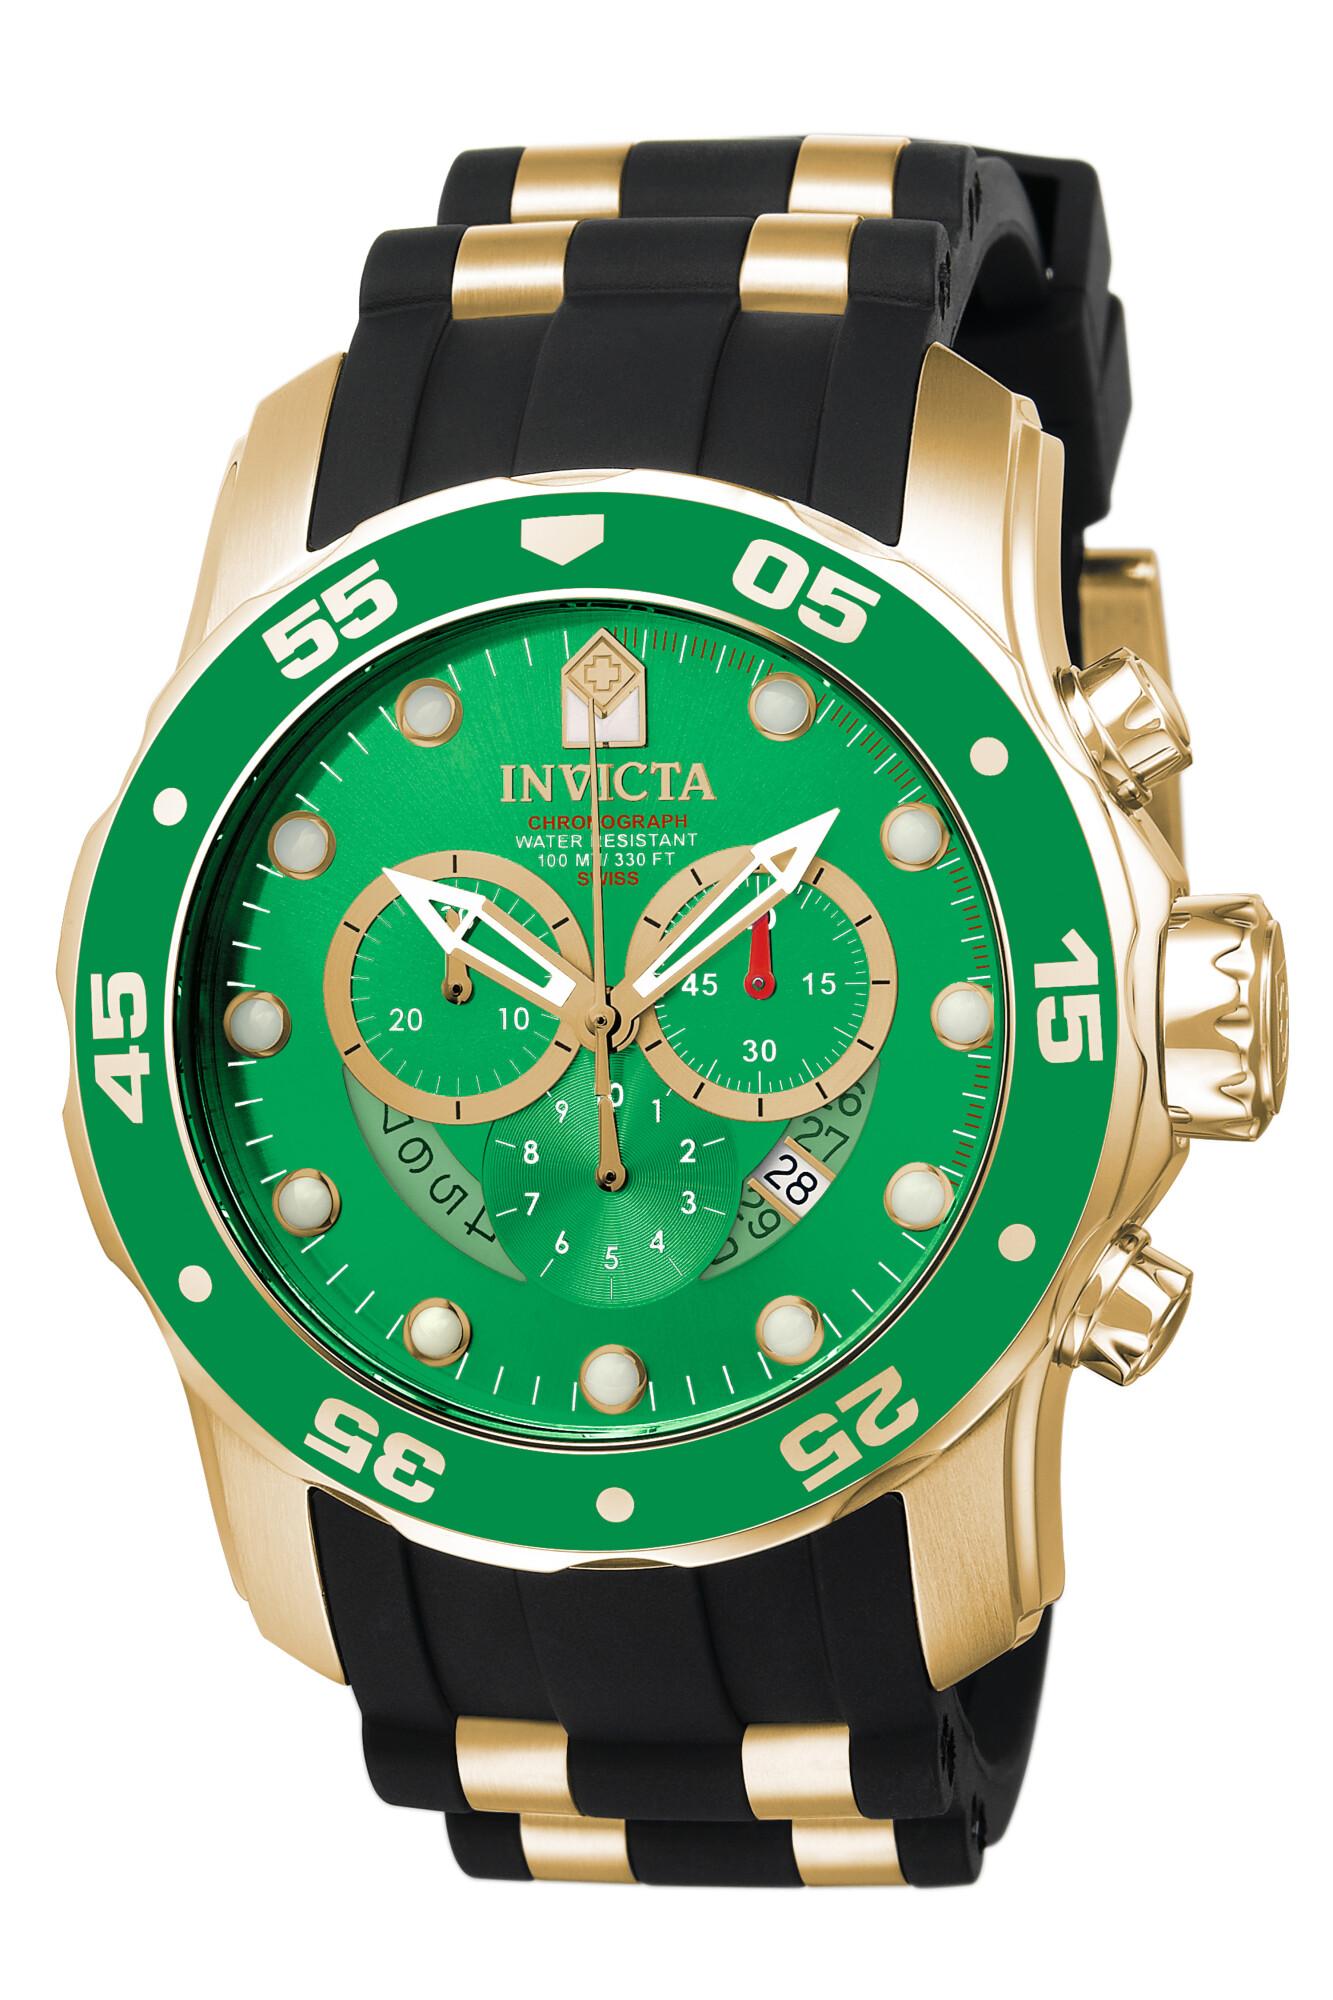 Invicta Men's Pro Diver 6984 Black Rubber Swiss Parts Quartz Dress Watch